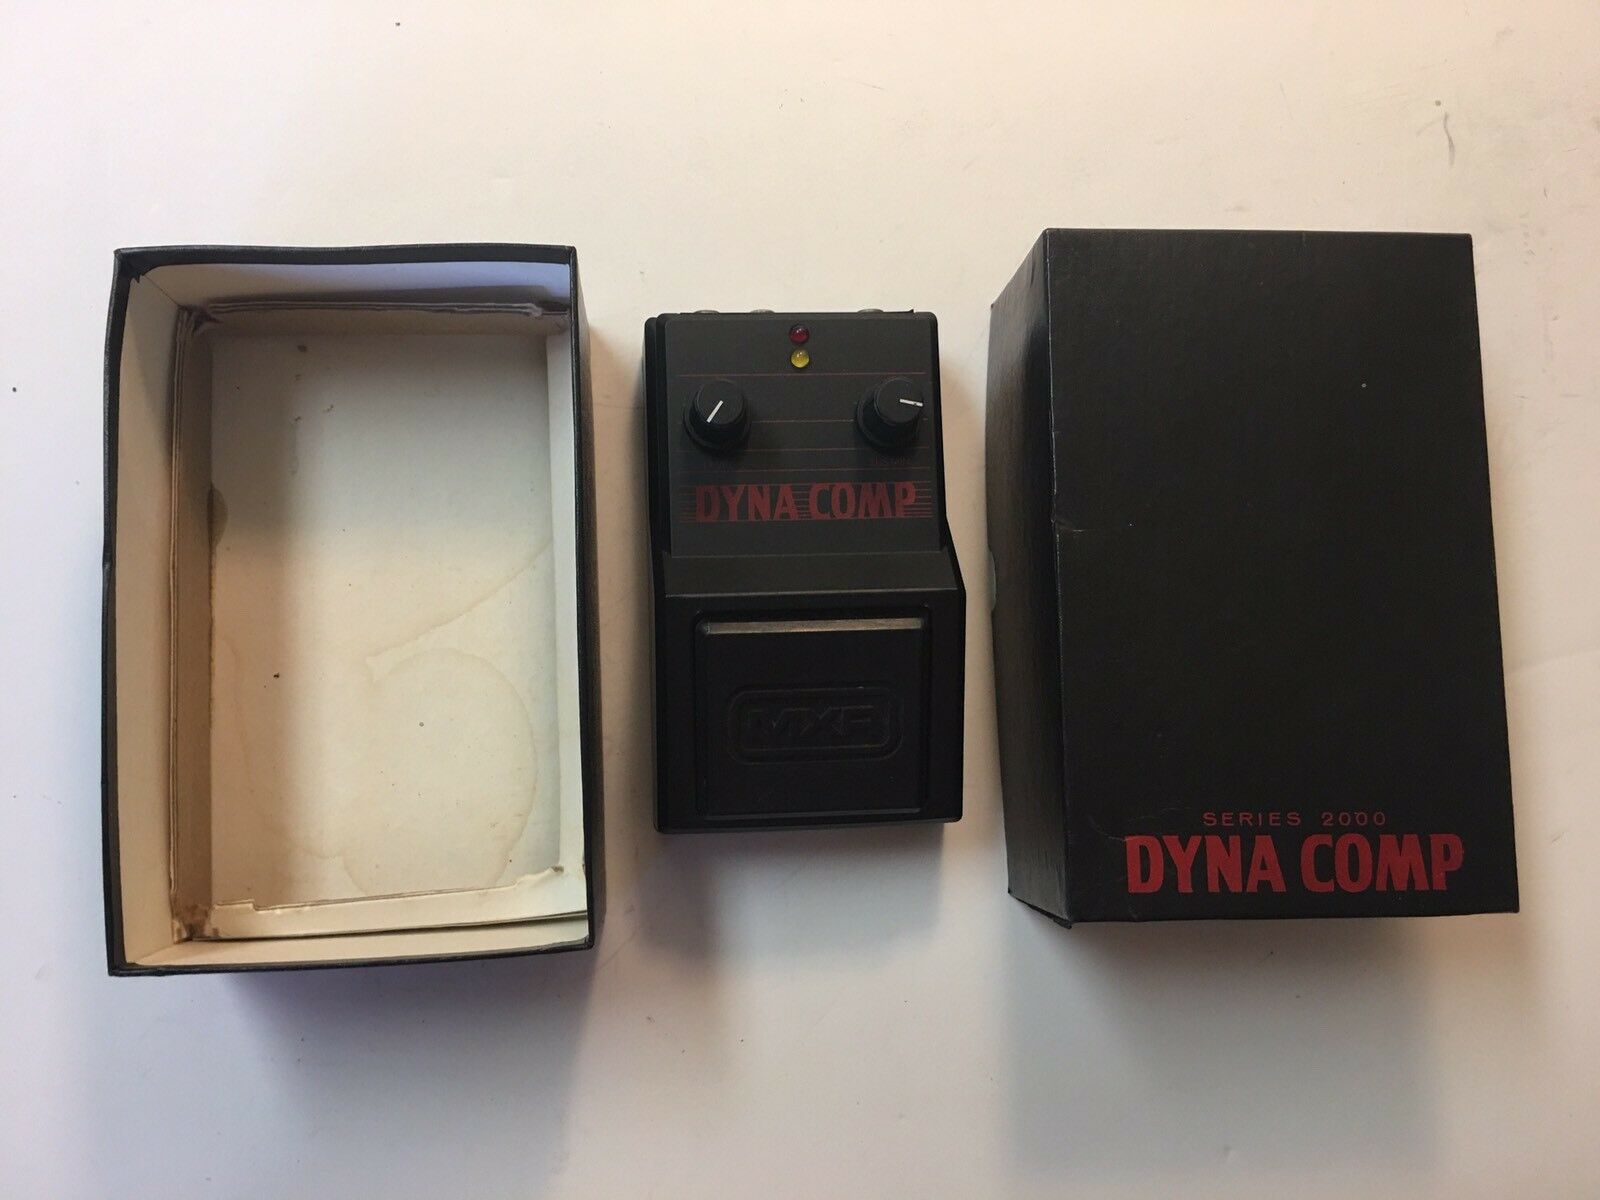 MXR M-202 Dyna Comp 2000 Series Compressor Rare Vintage Guitar Effect Pedal